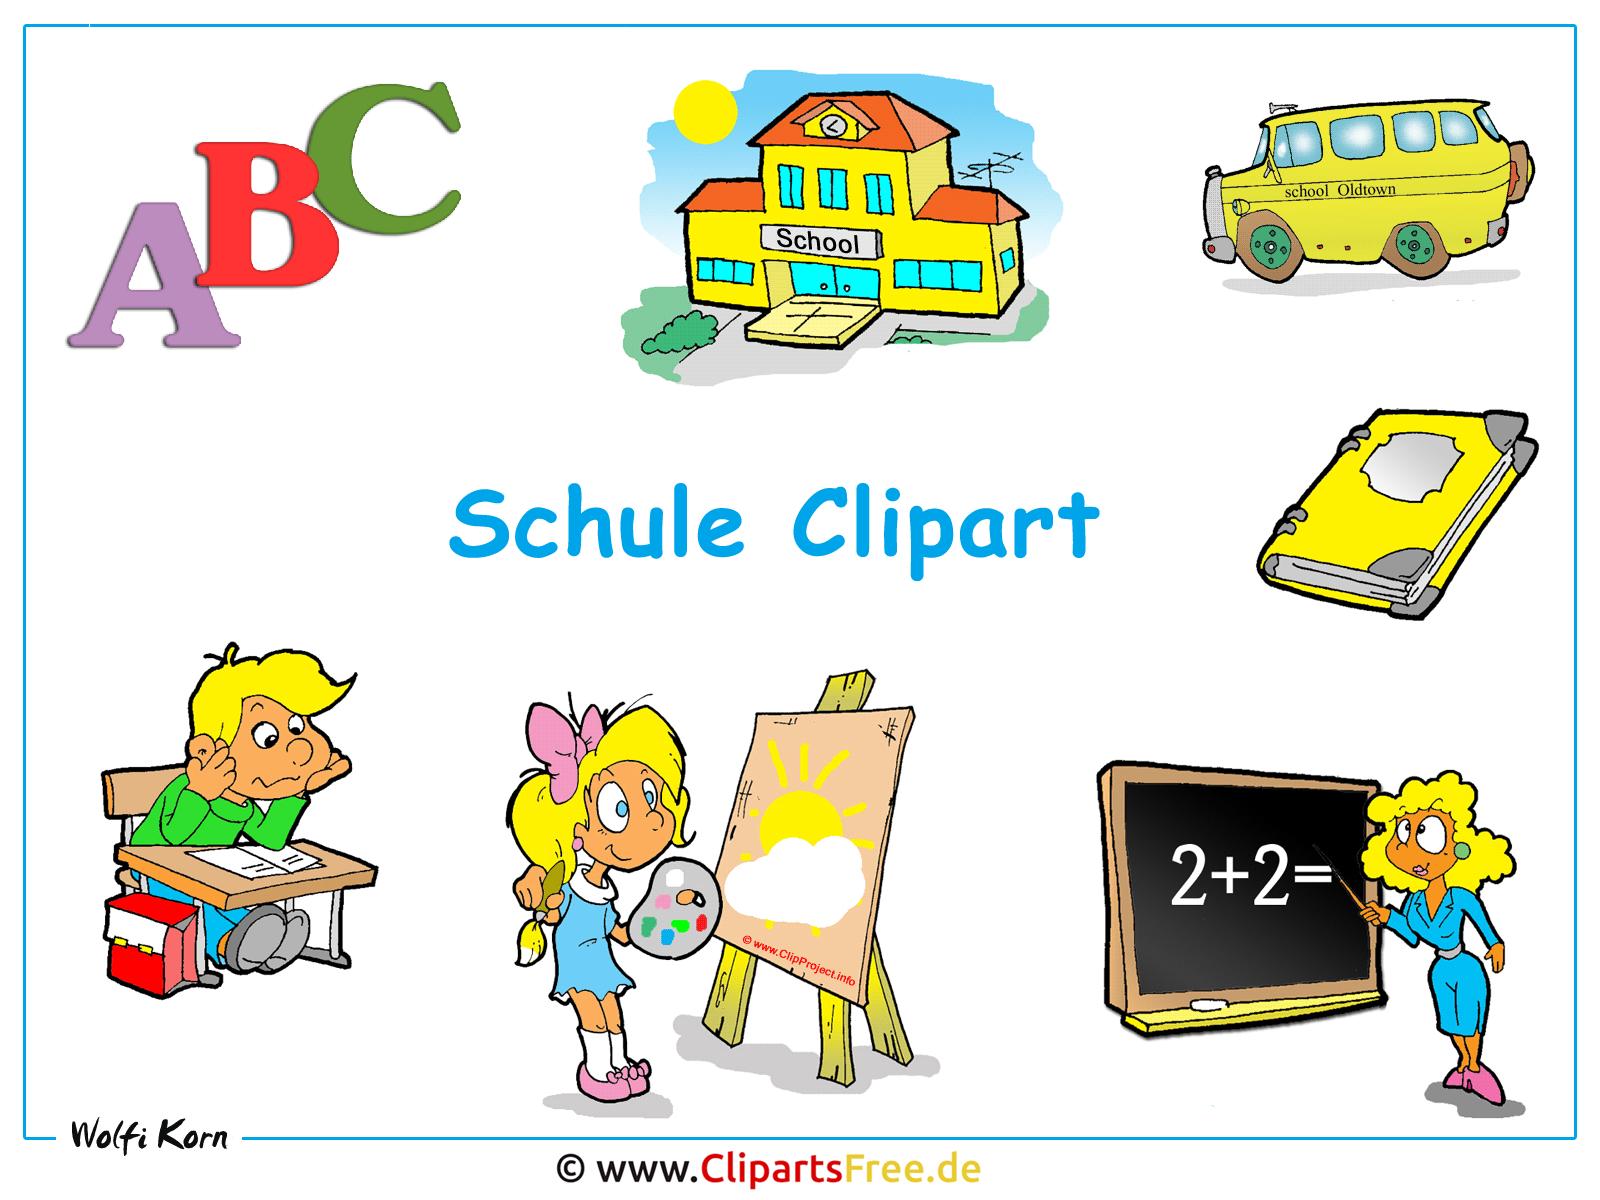 clipart kostenlos download - photo #6